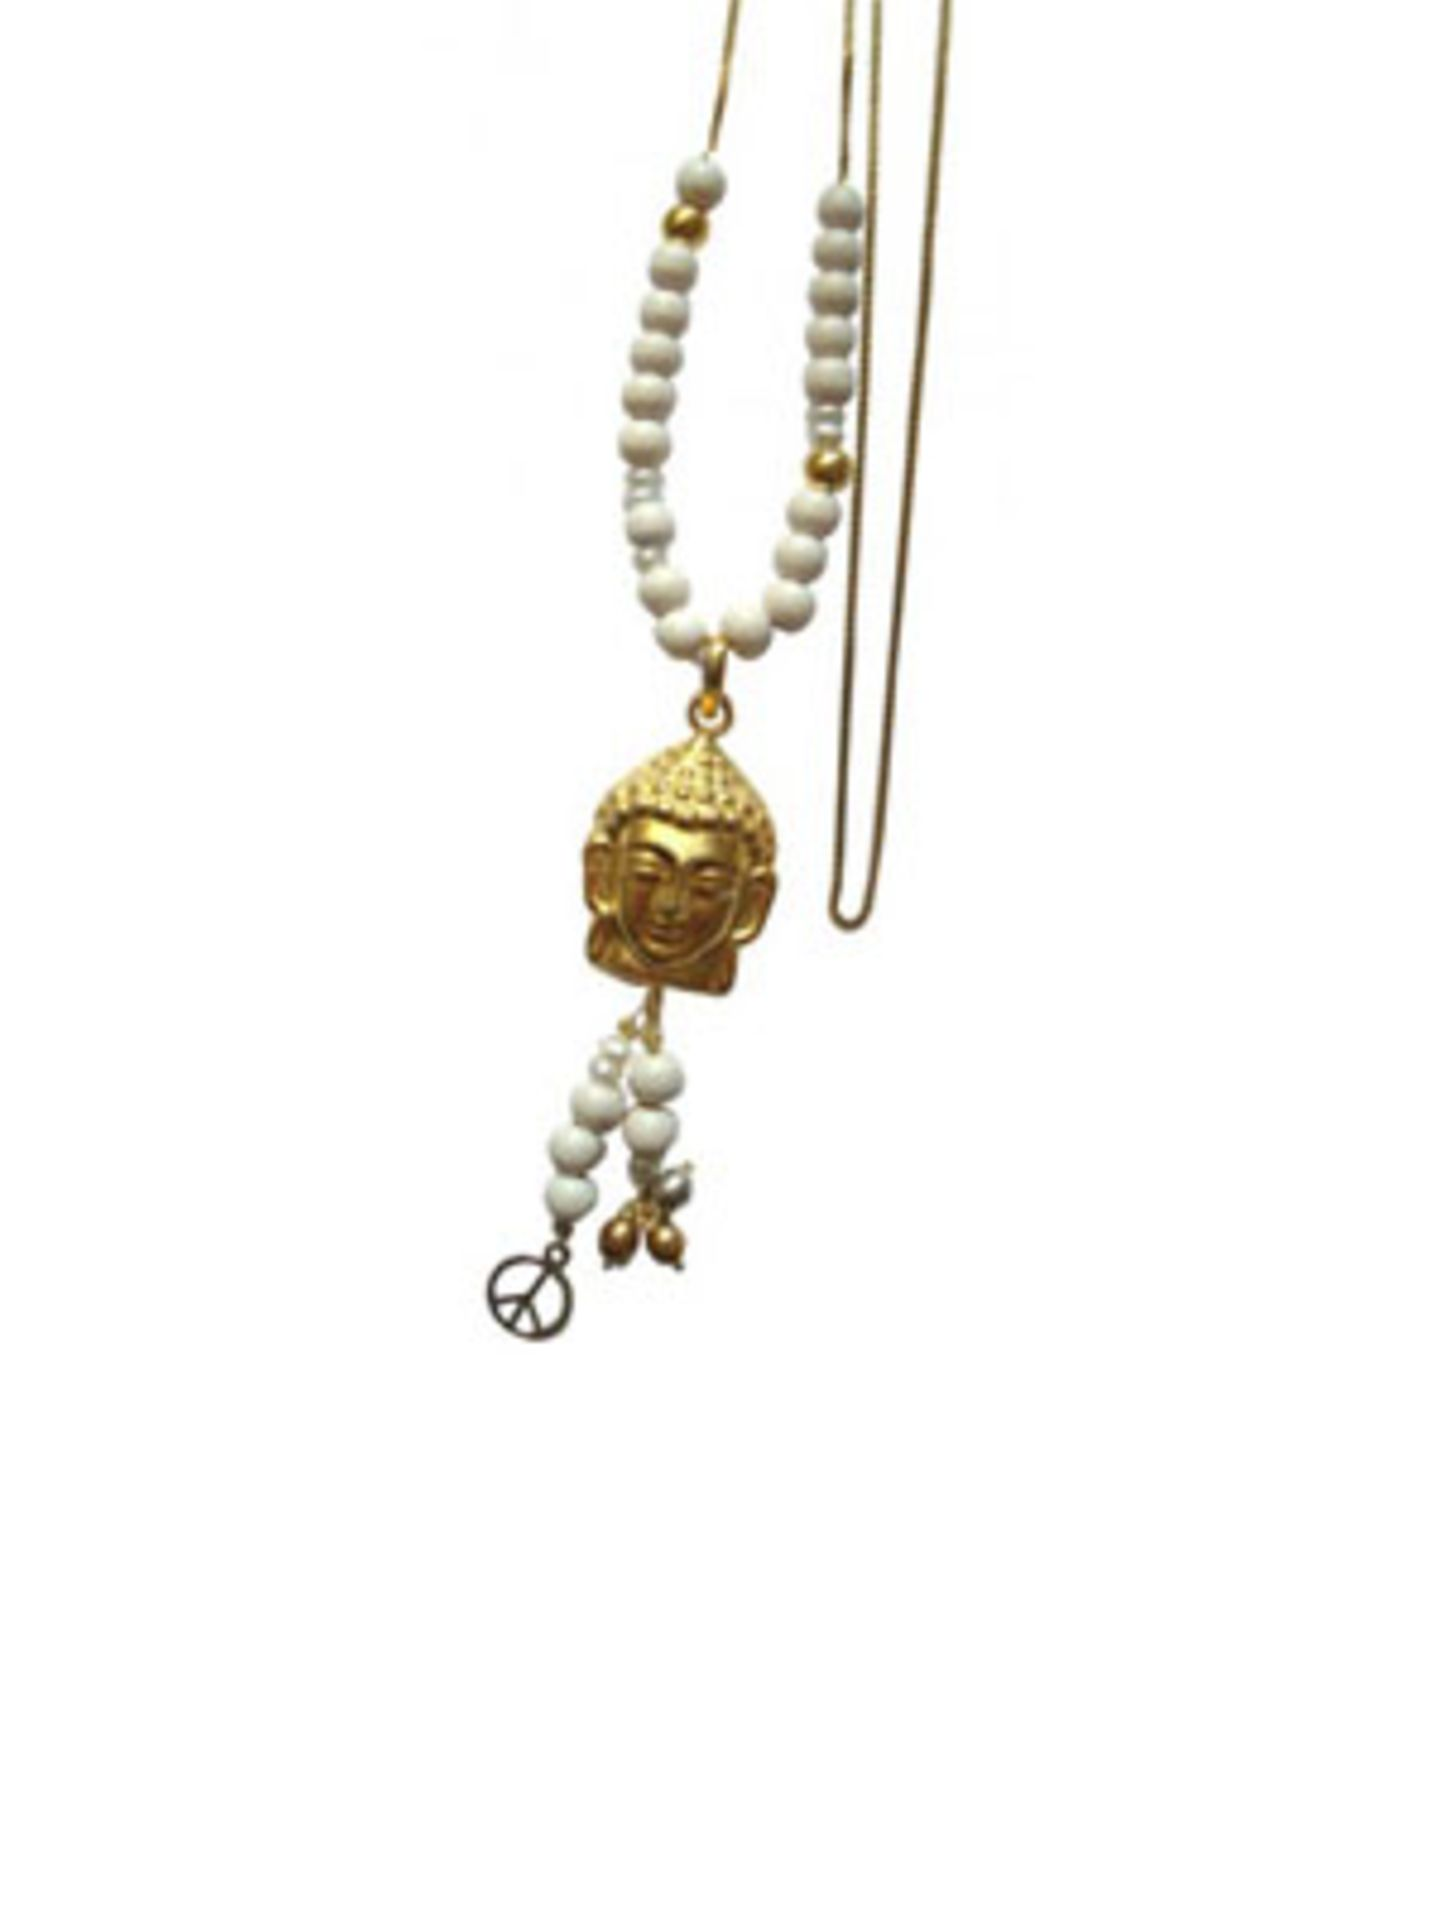 Friedvolle Perlenkette mit Buddha-Kopf von Daily Obsessions, um 110 Euro. Über www.dailyobsessions.com.